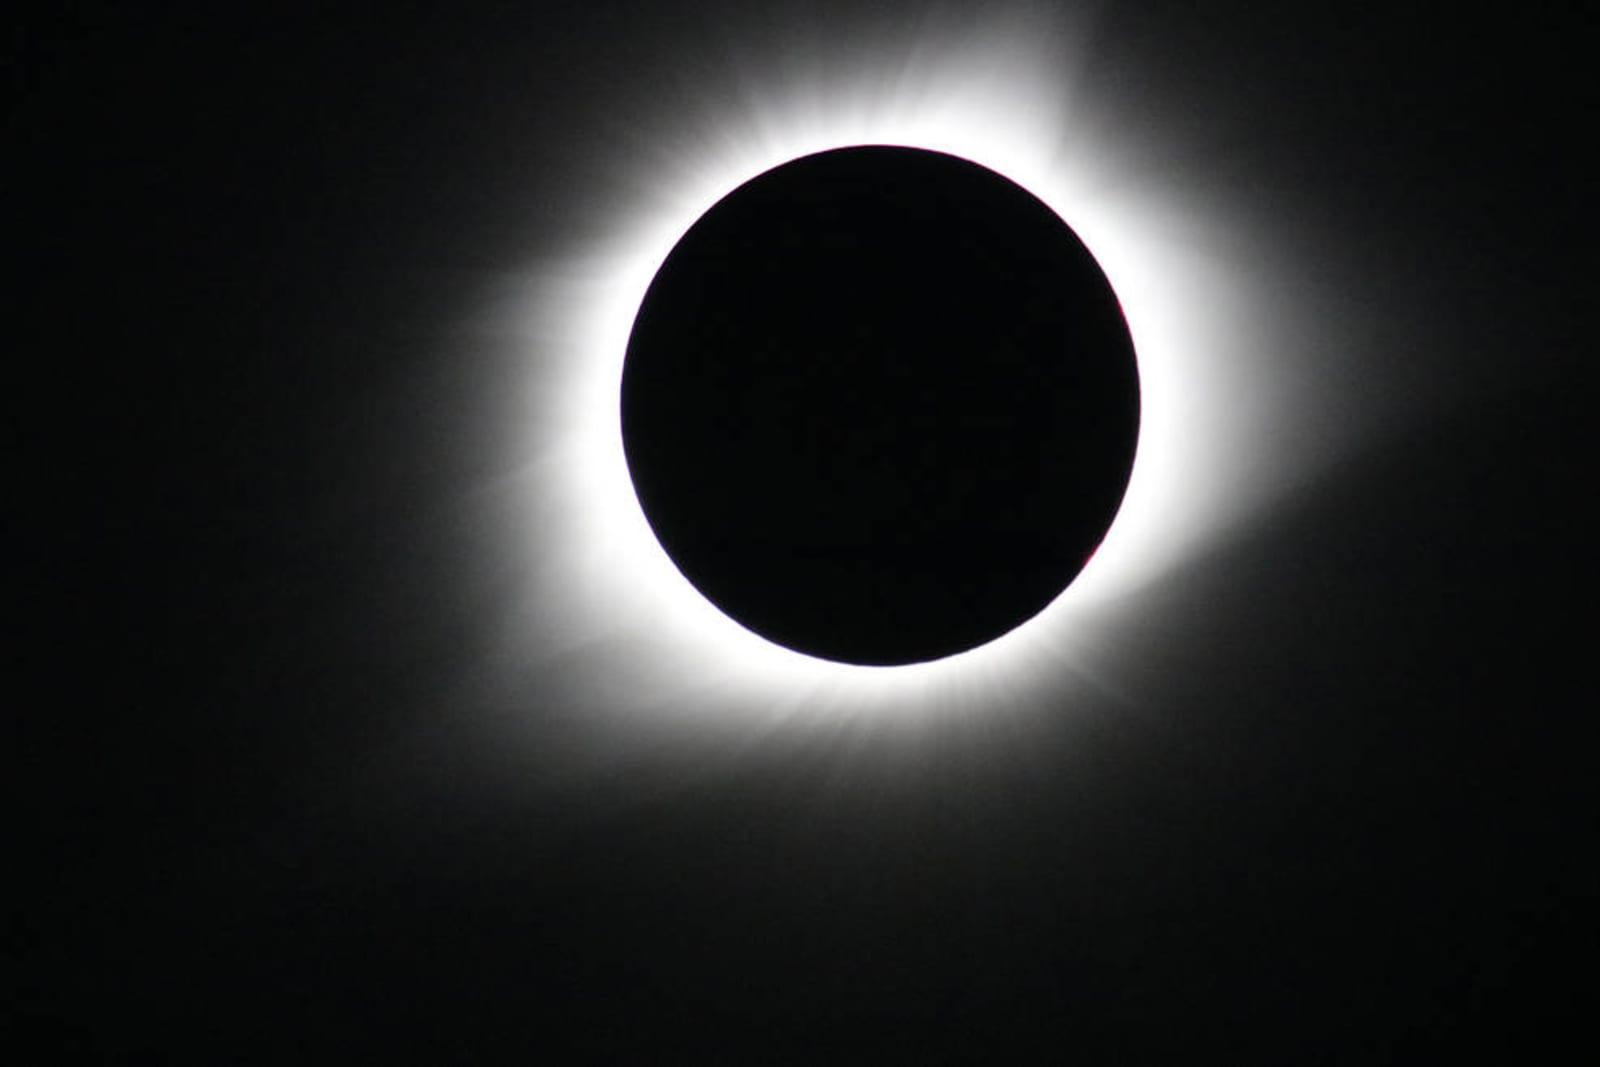 NASA will livestream the total solar eclipse over South America tomorrow